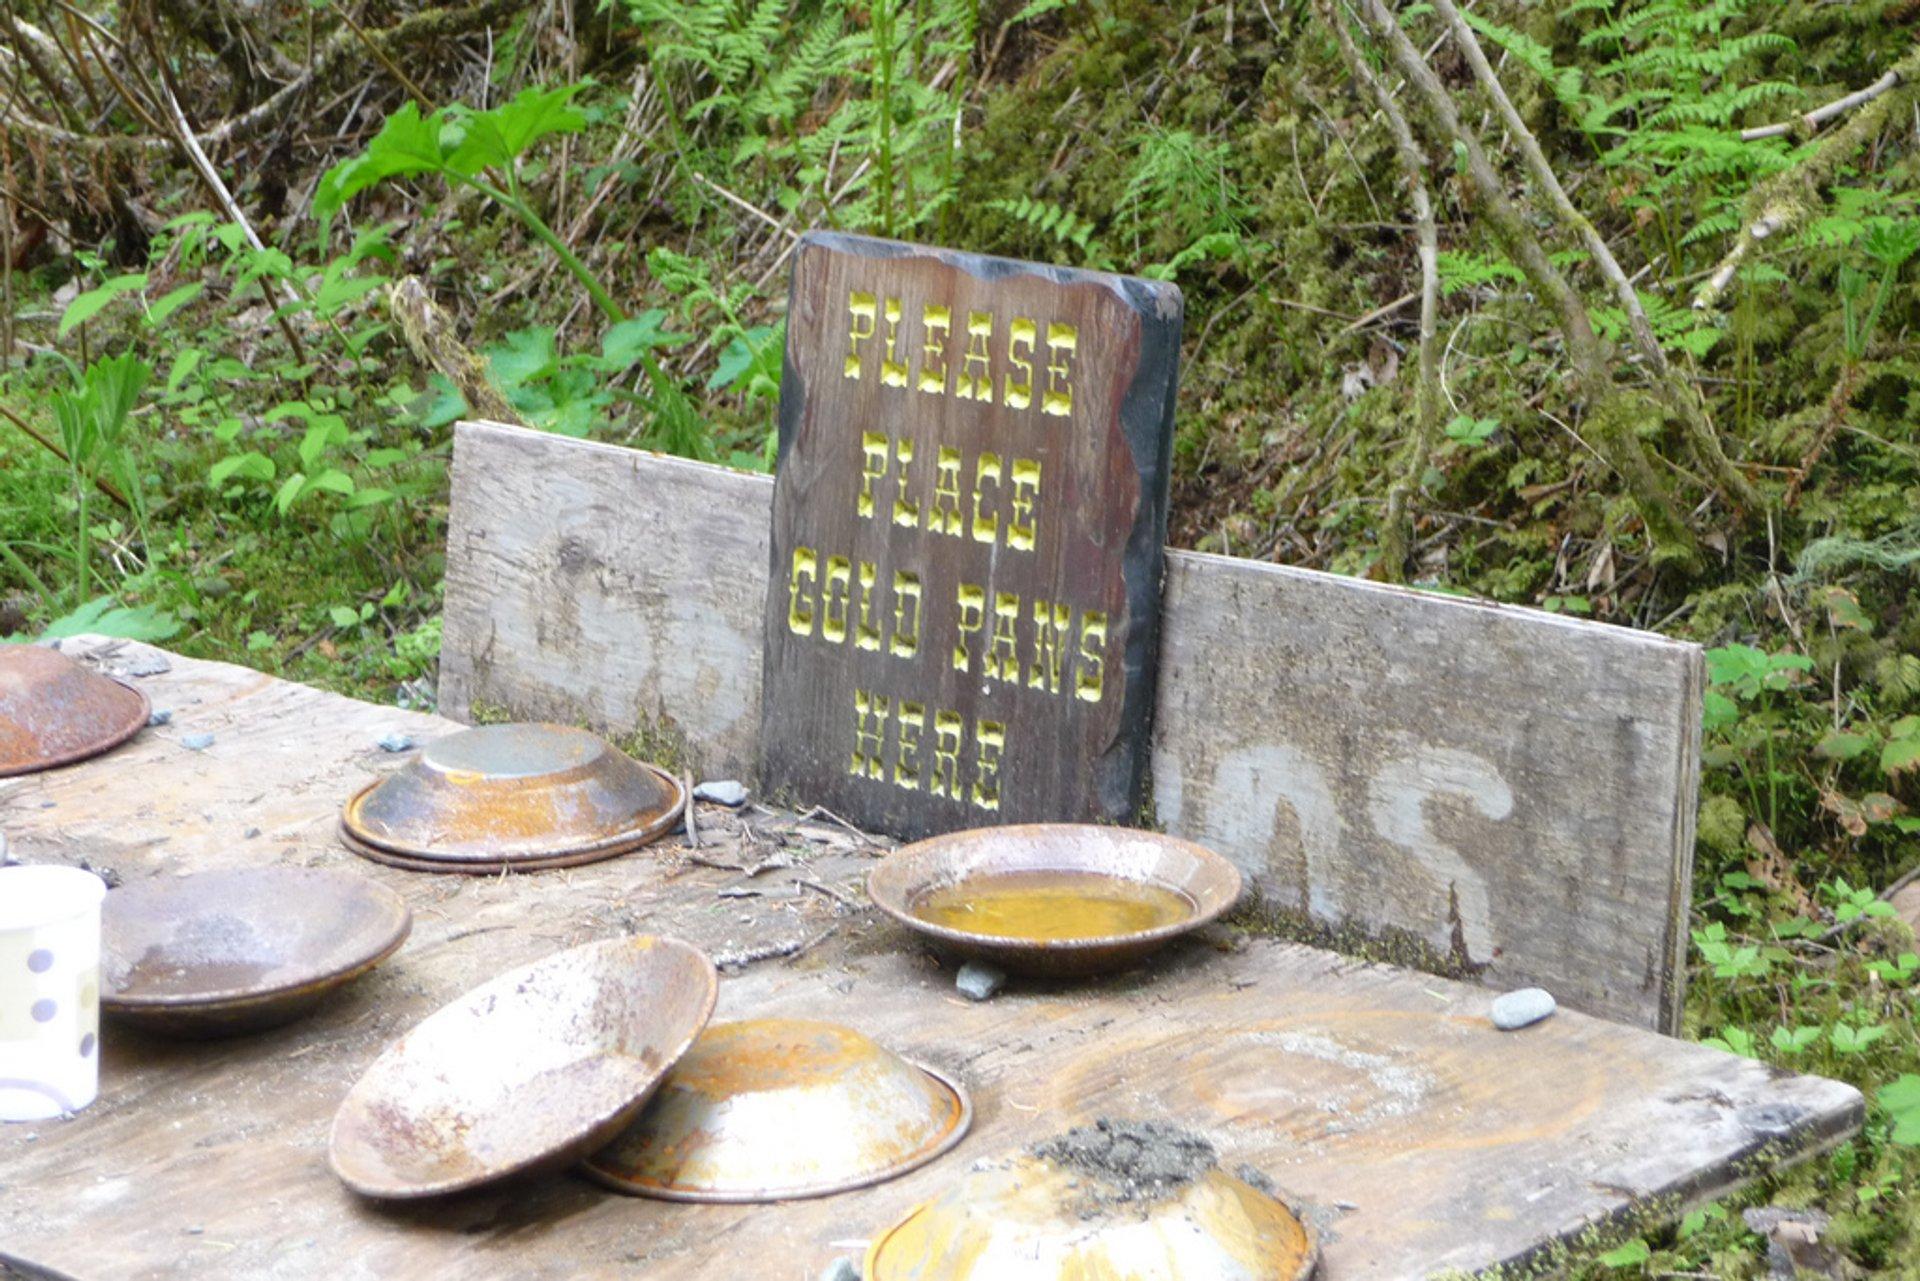 Gold pans in Juneau 2019